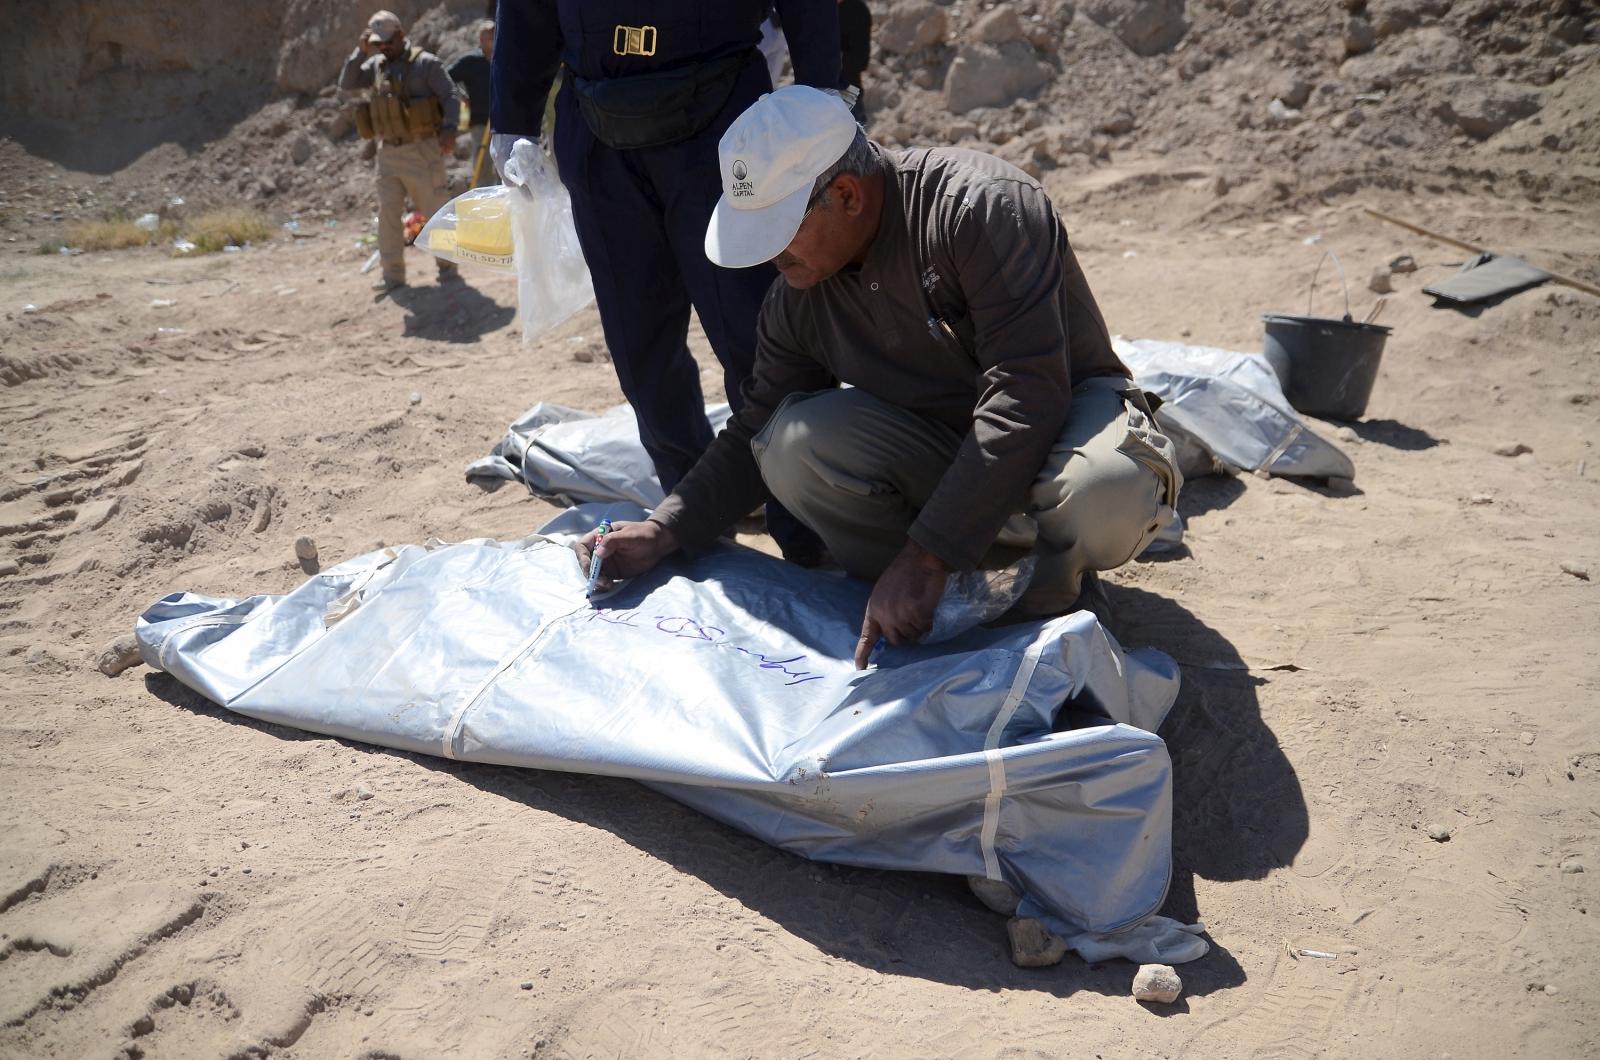 Mass grave Tikrit Saddam Hussein hometown